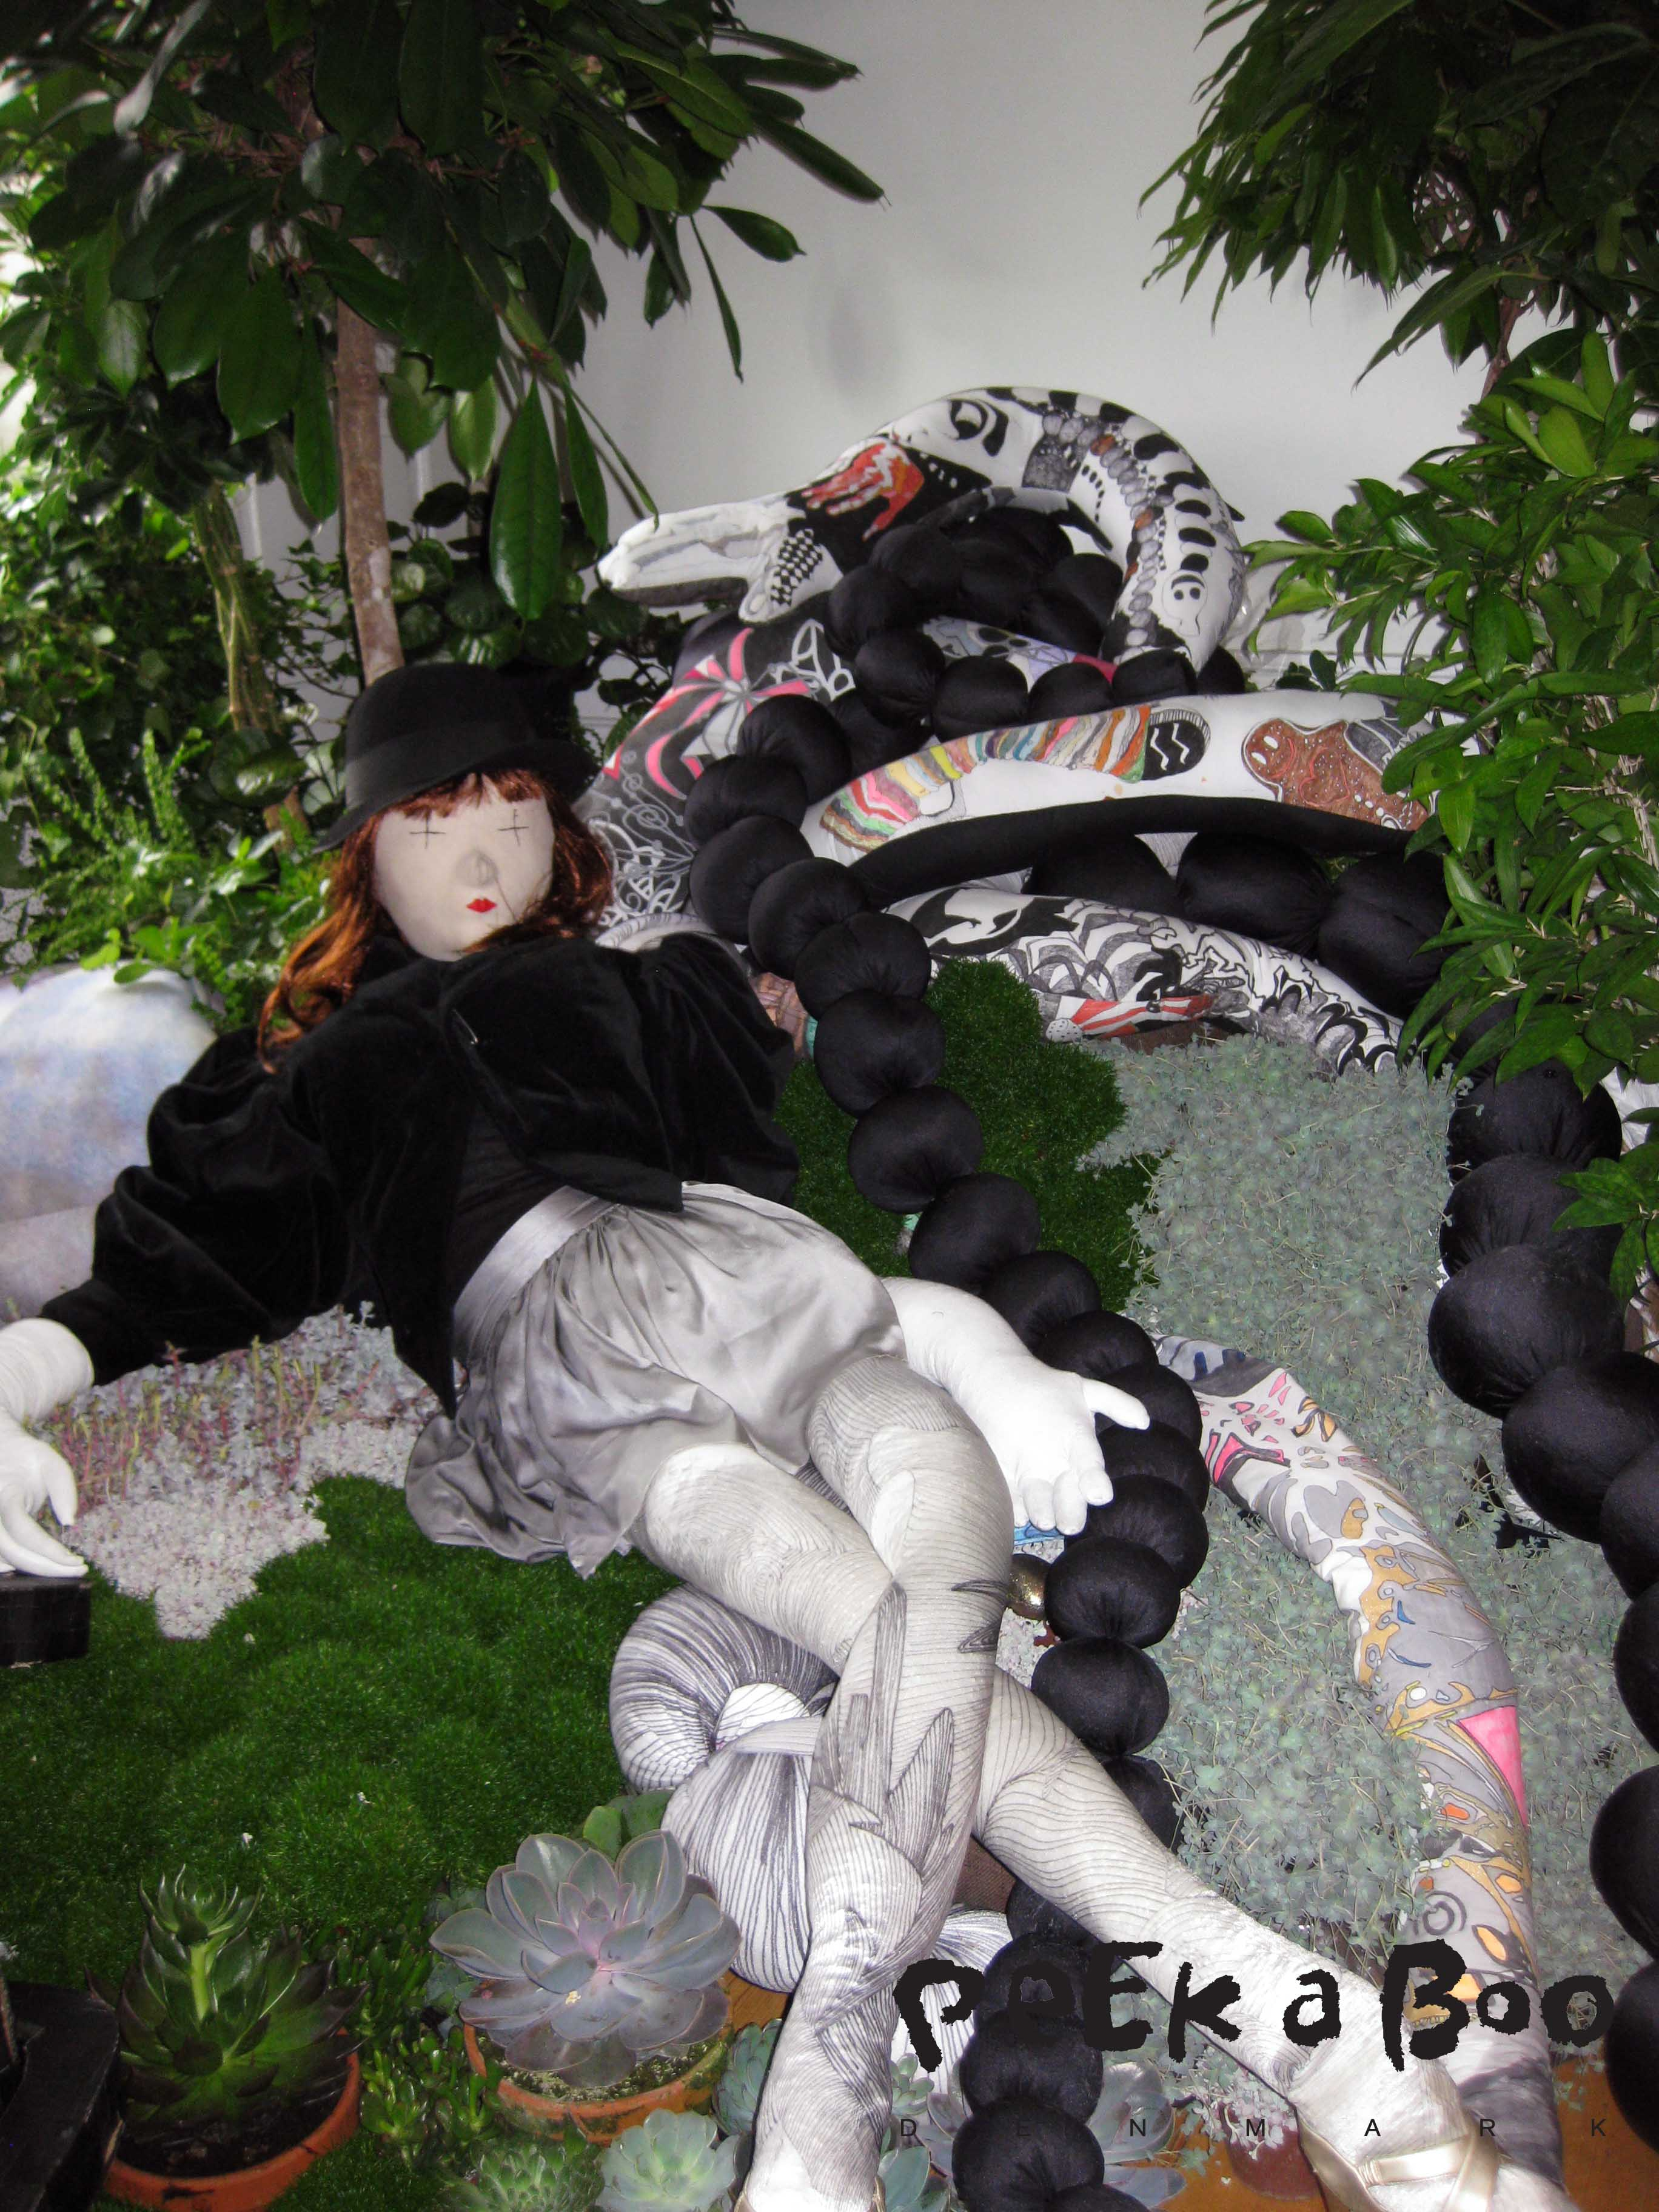 Helle Mardahl's installation i blomster